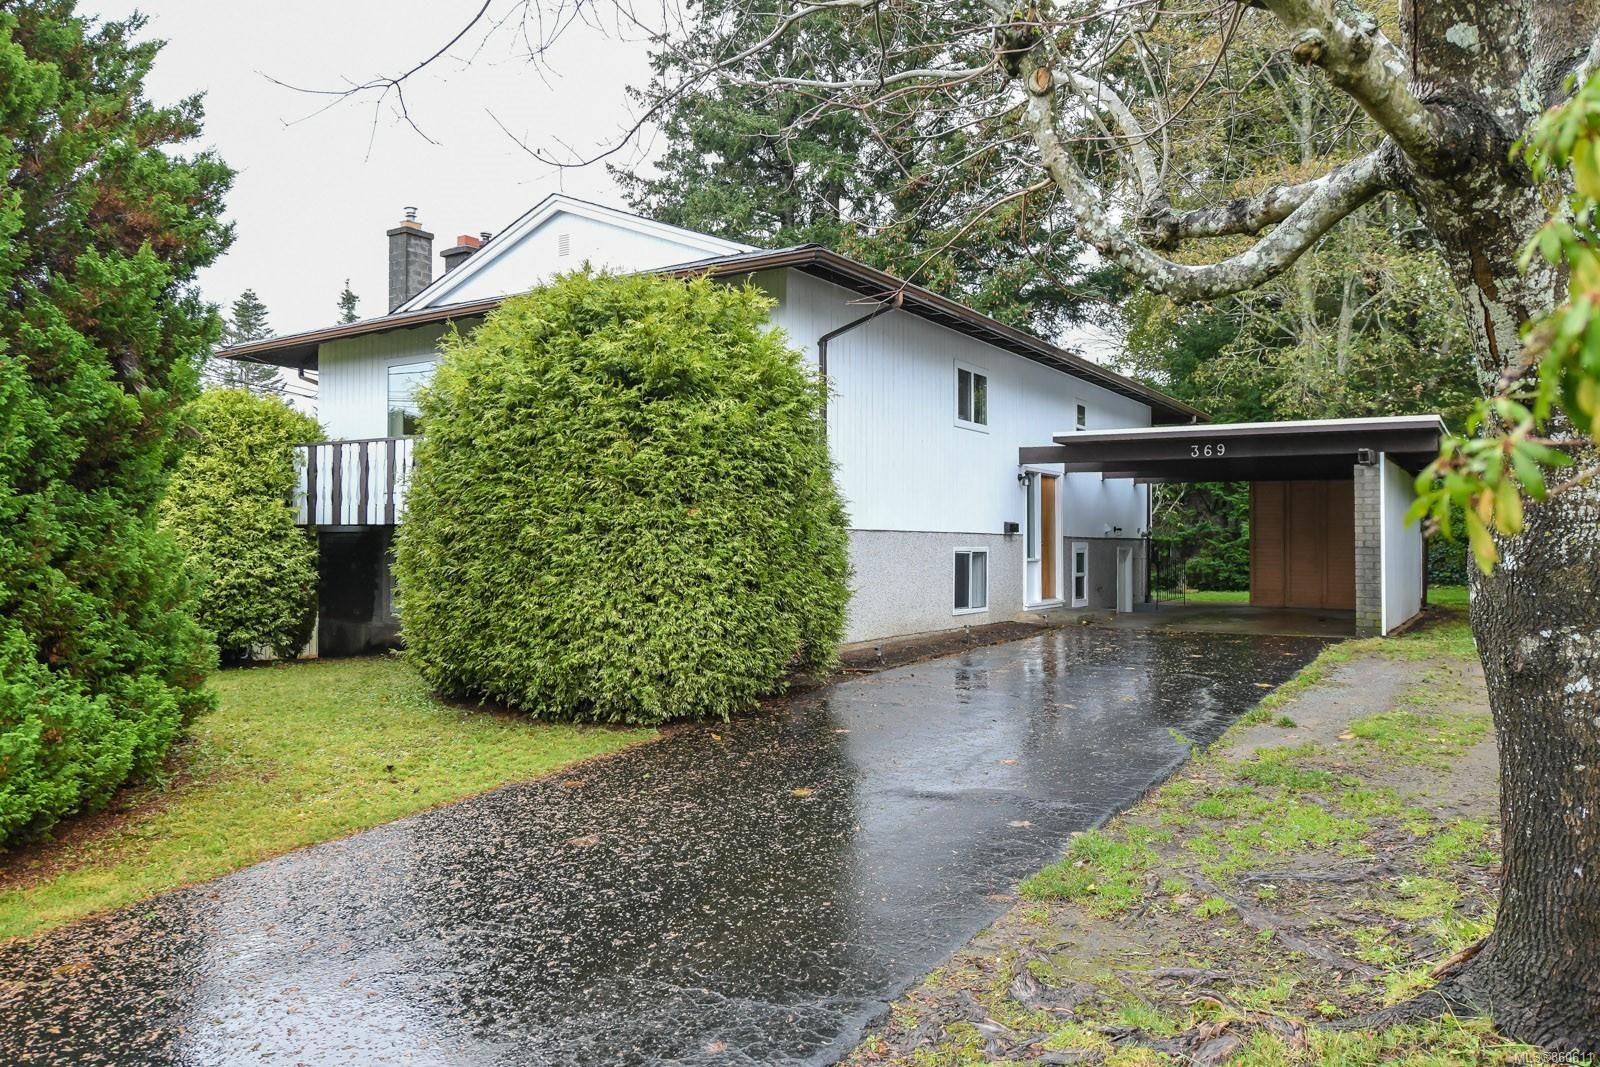 Main Photo: 369 Aitken St in : CV Comox (Town of) House for sale (Comox Valley)  : MLS®# 860611